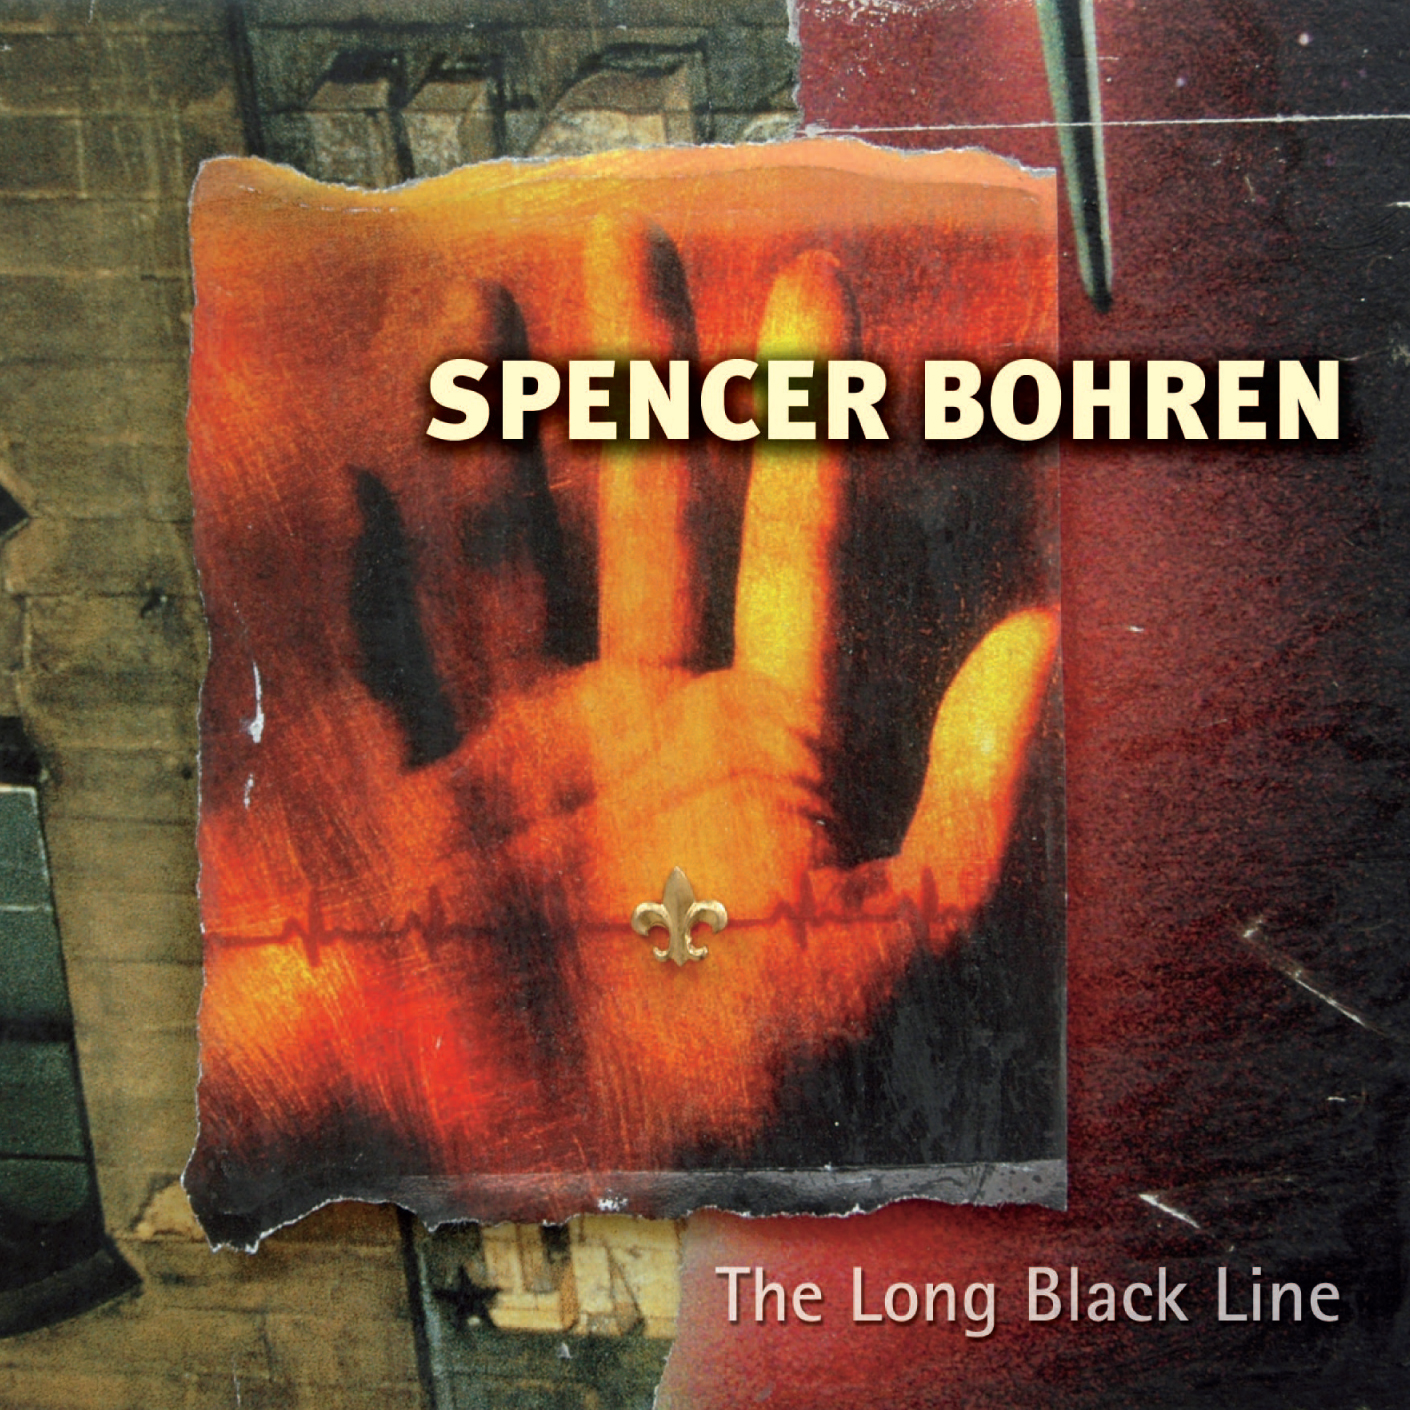 SpencerBohren-LongBlackLineCover.jpg